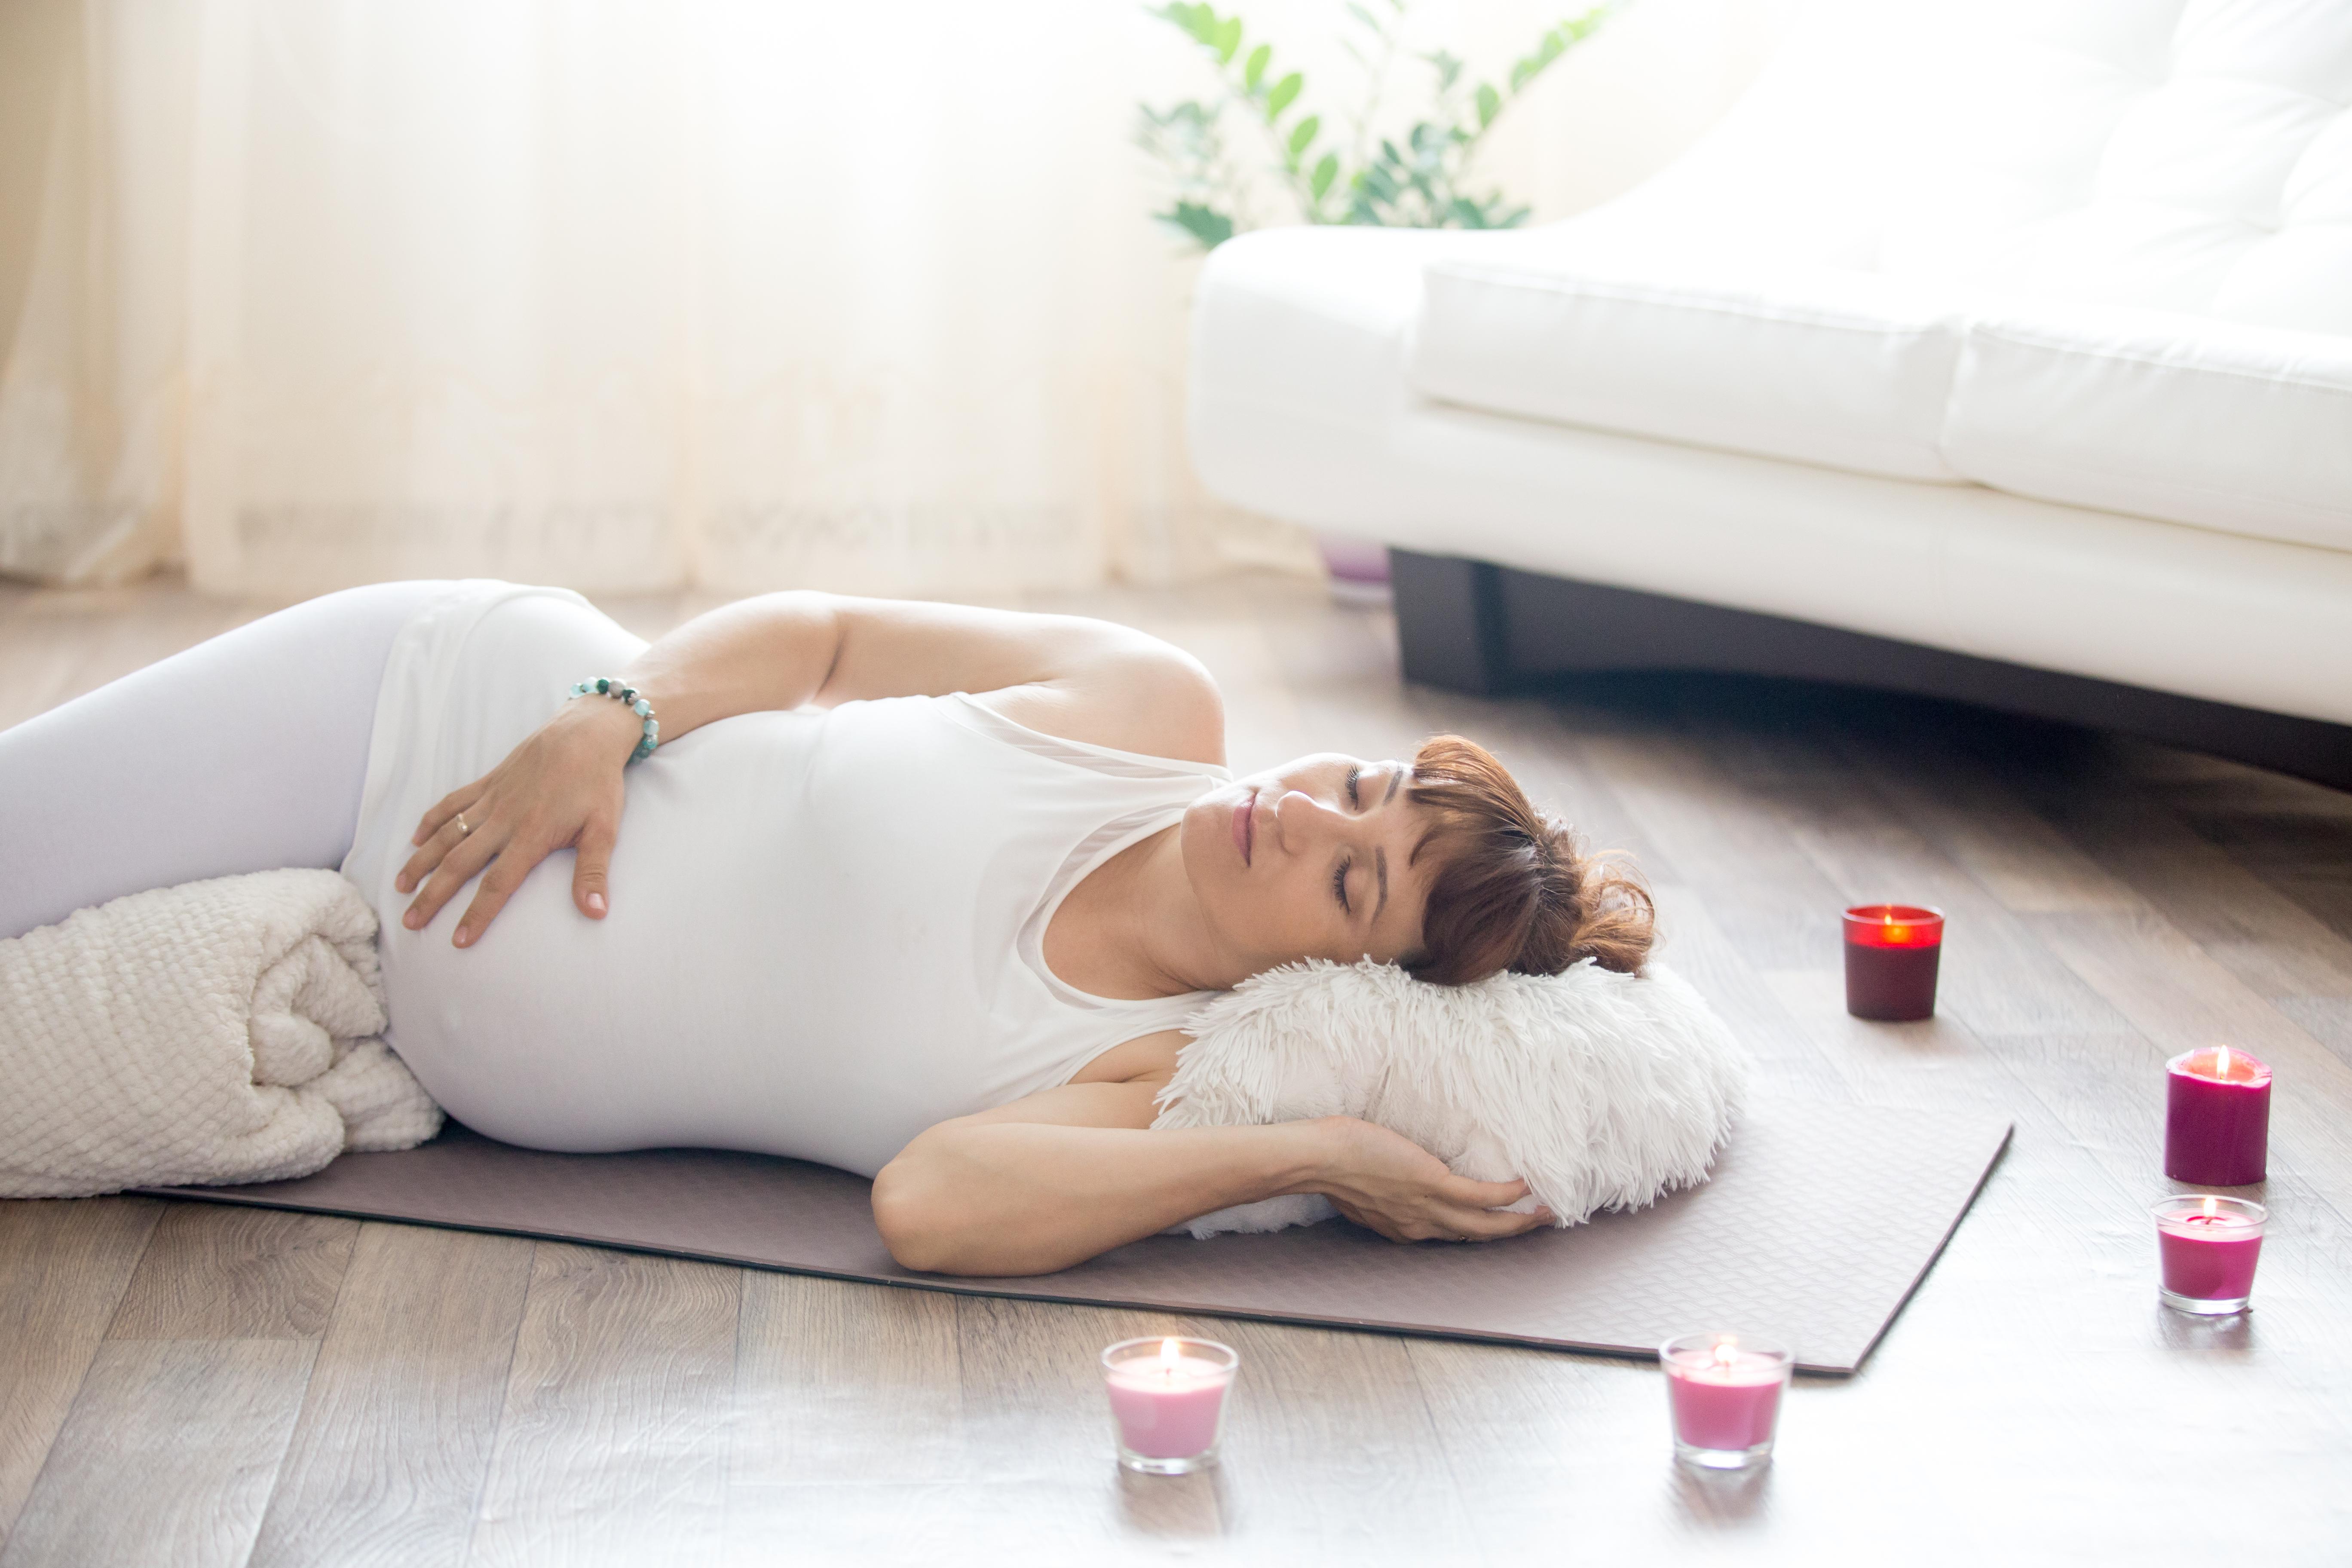 prenatal yoga, relaxation, meditation, pregnancy